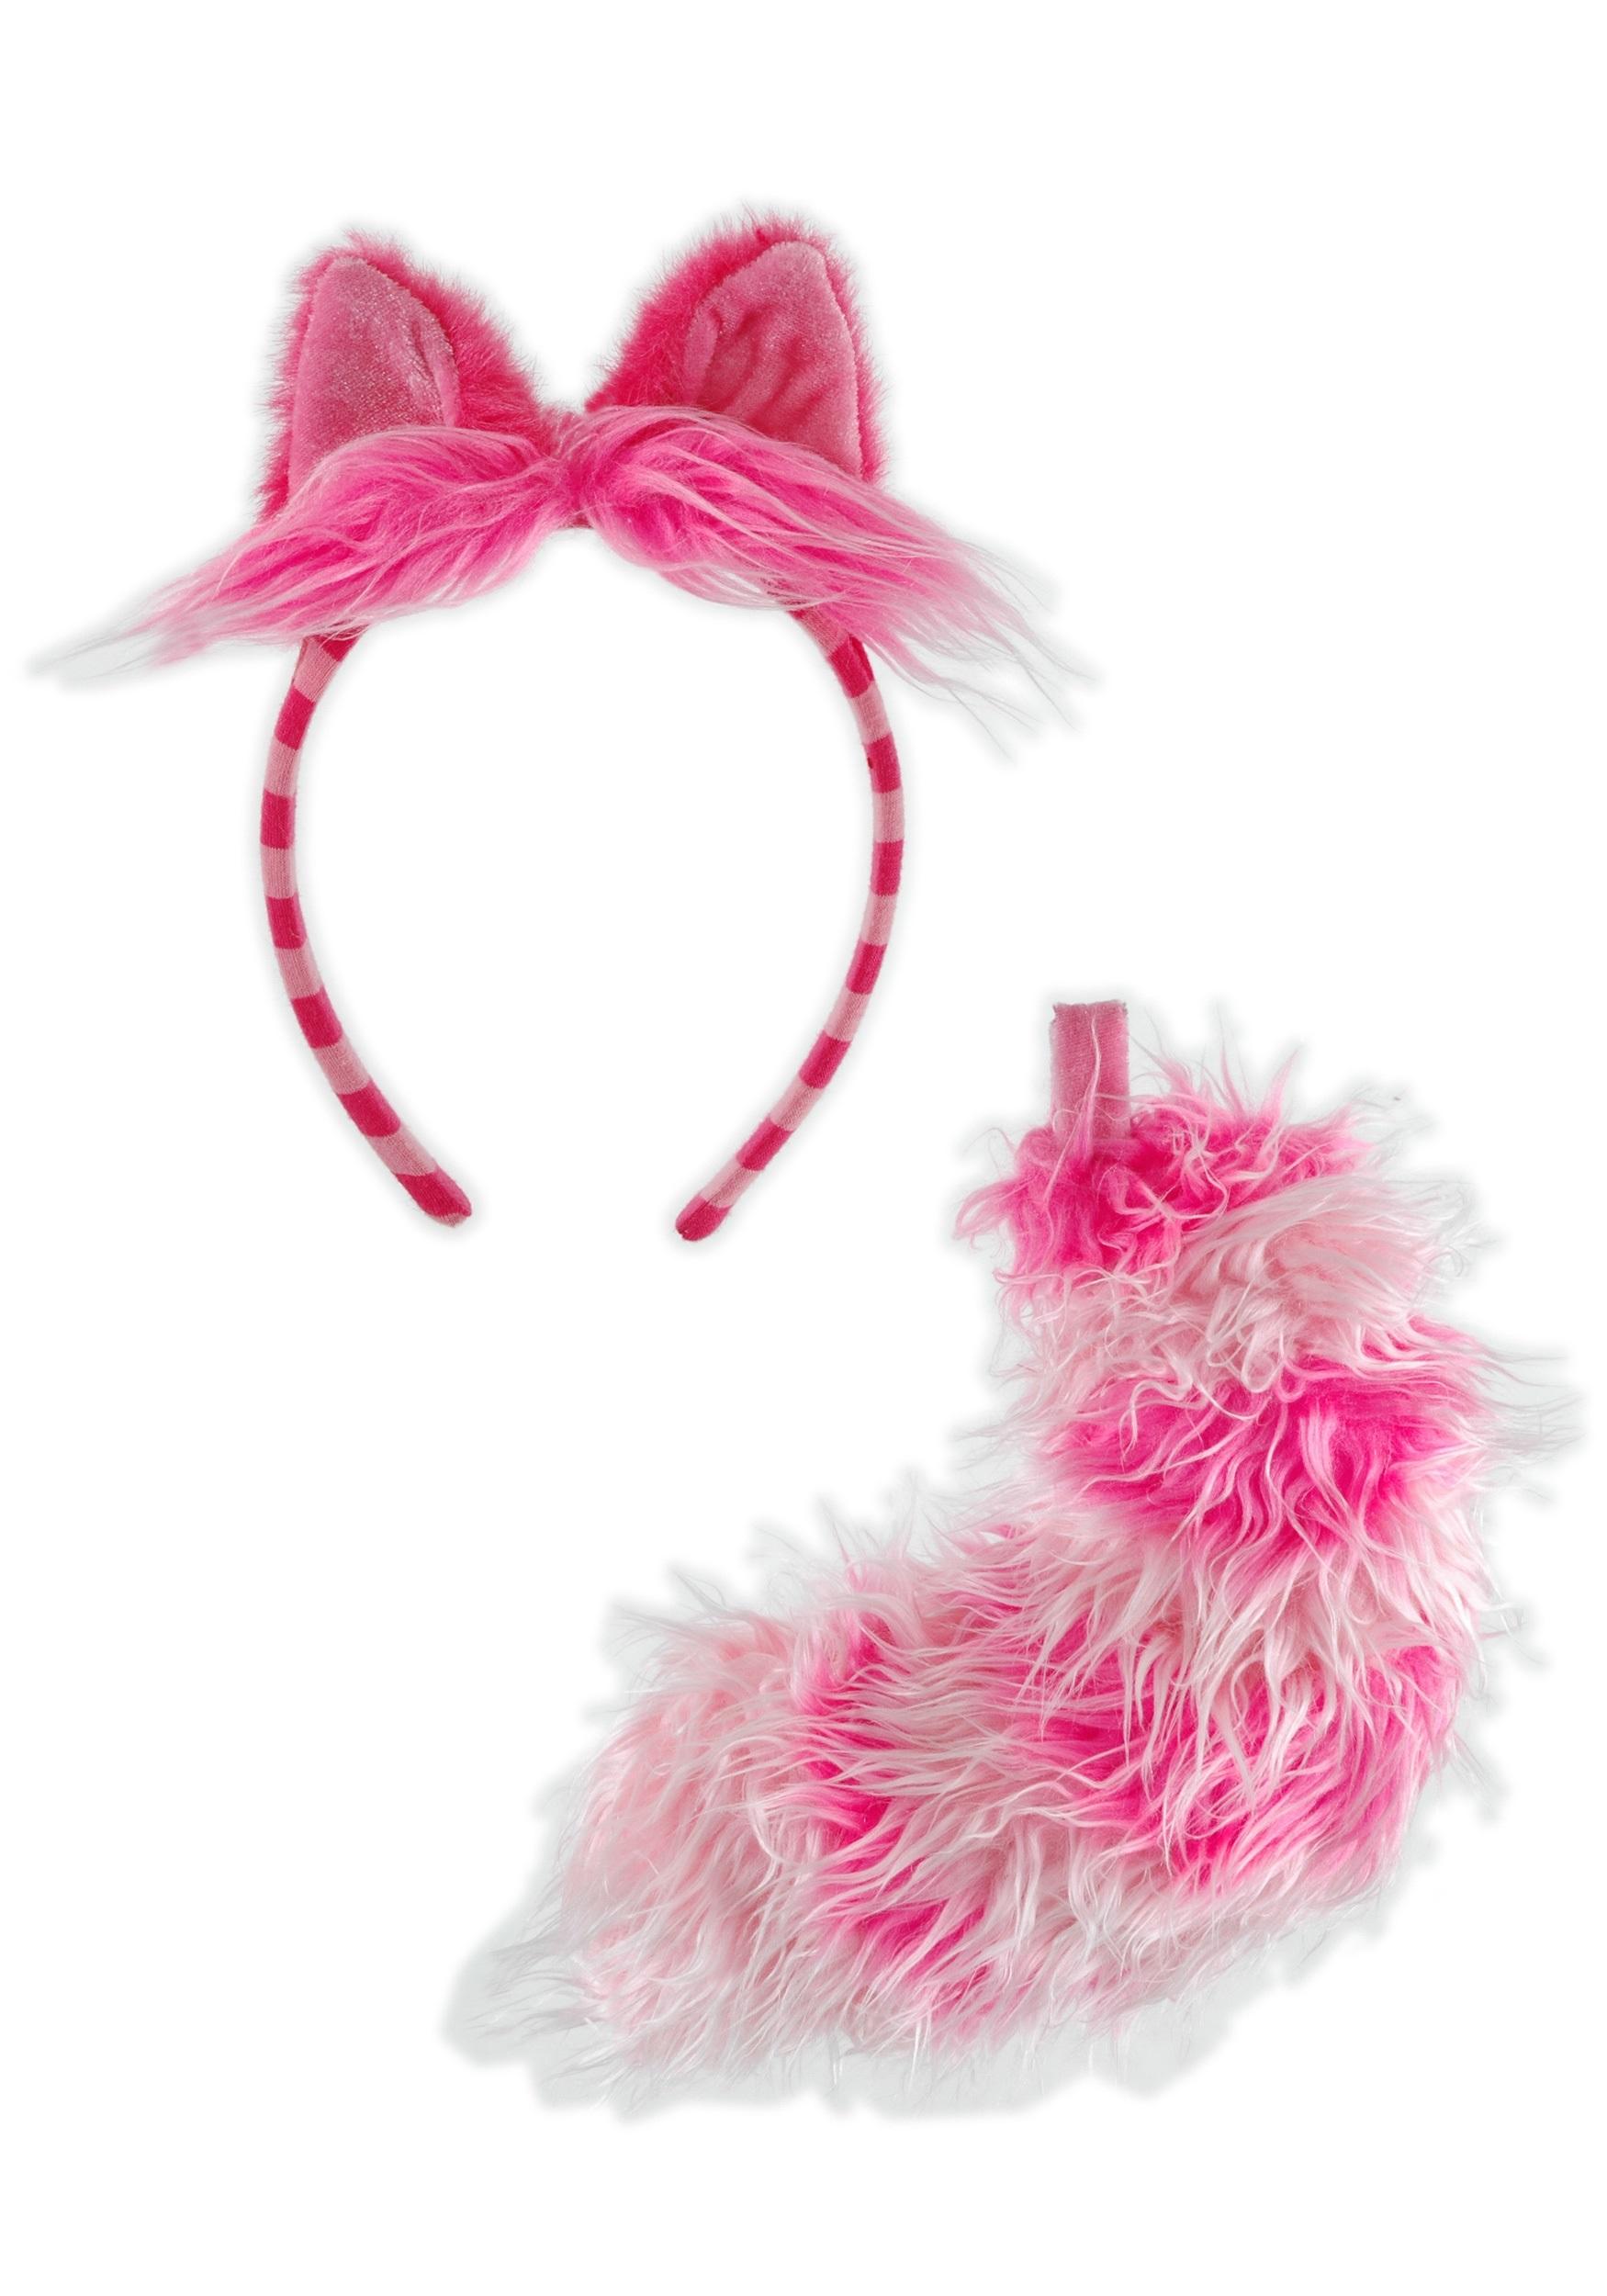 animal accessories - adult, kids animal costume accessory